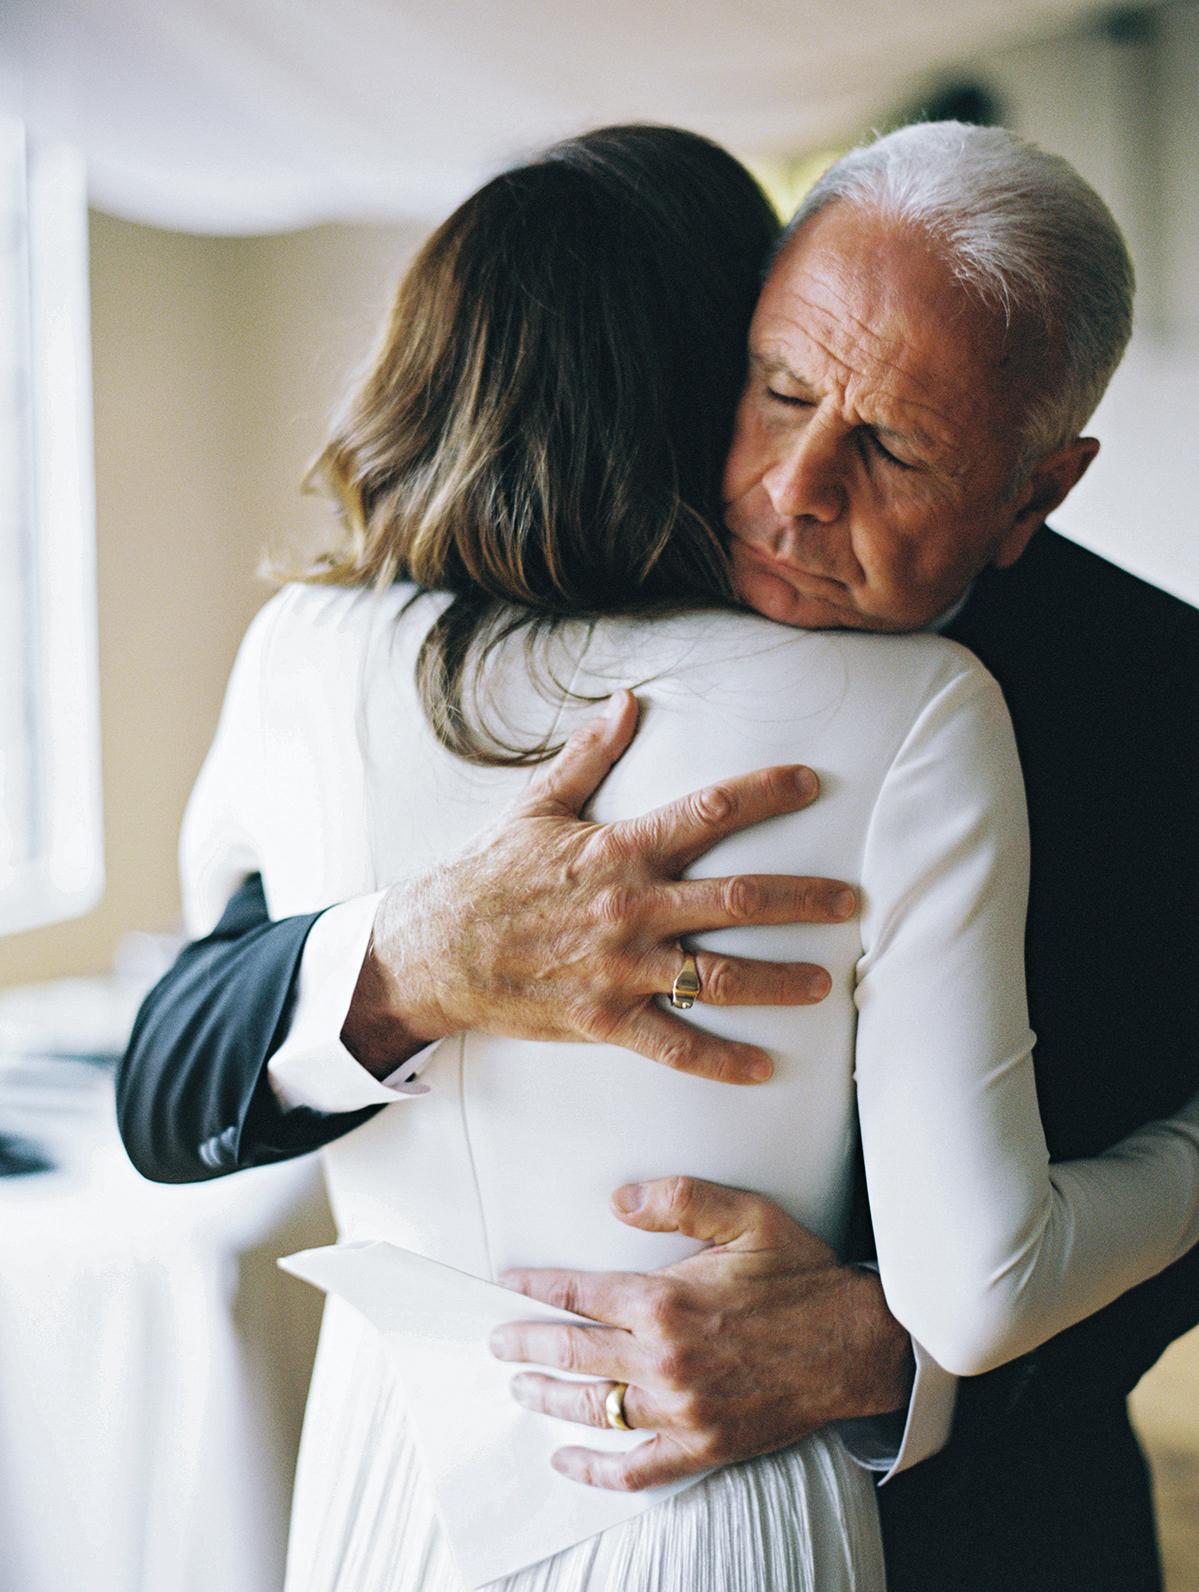 joanna jay wedding father embrace